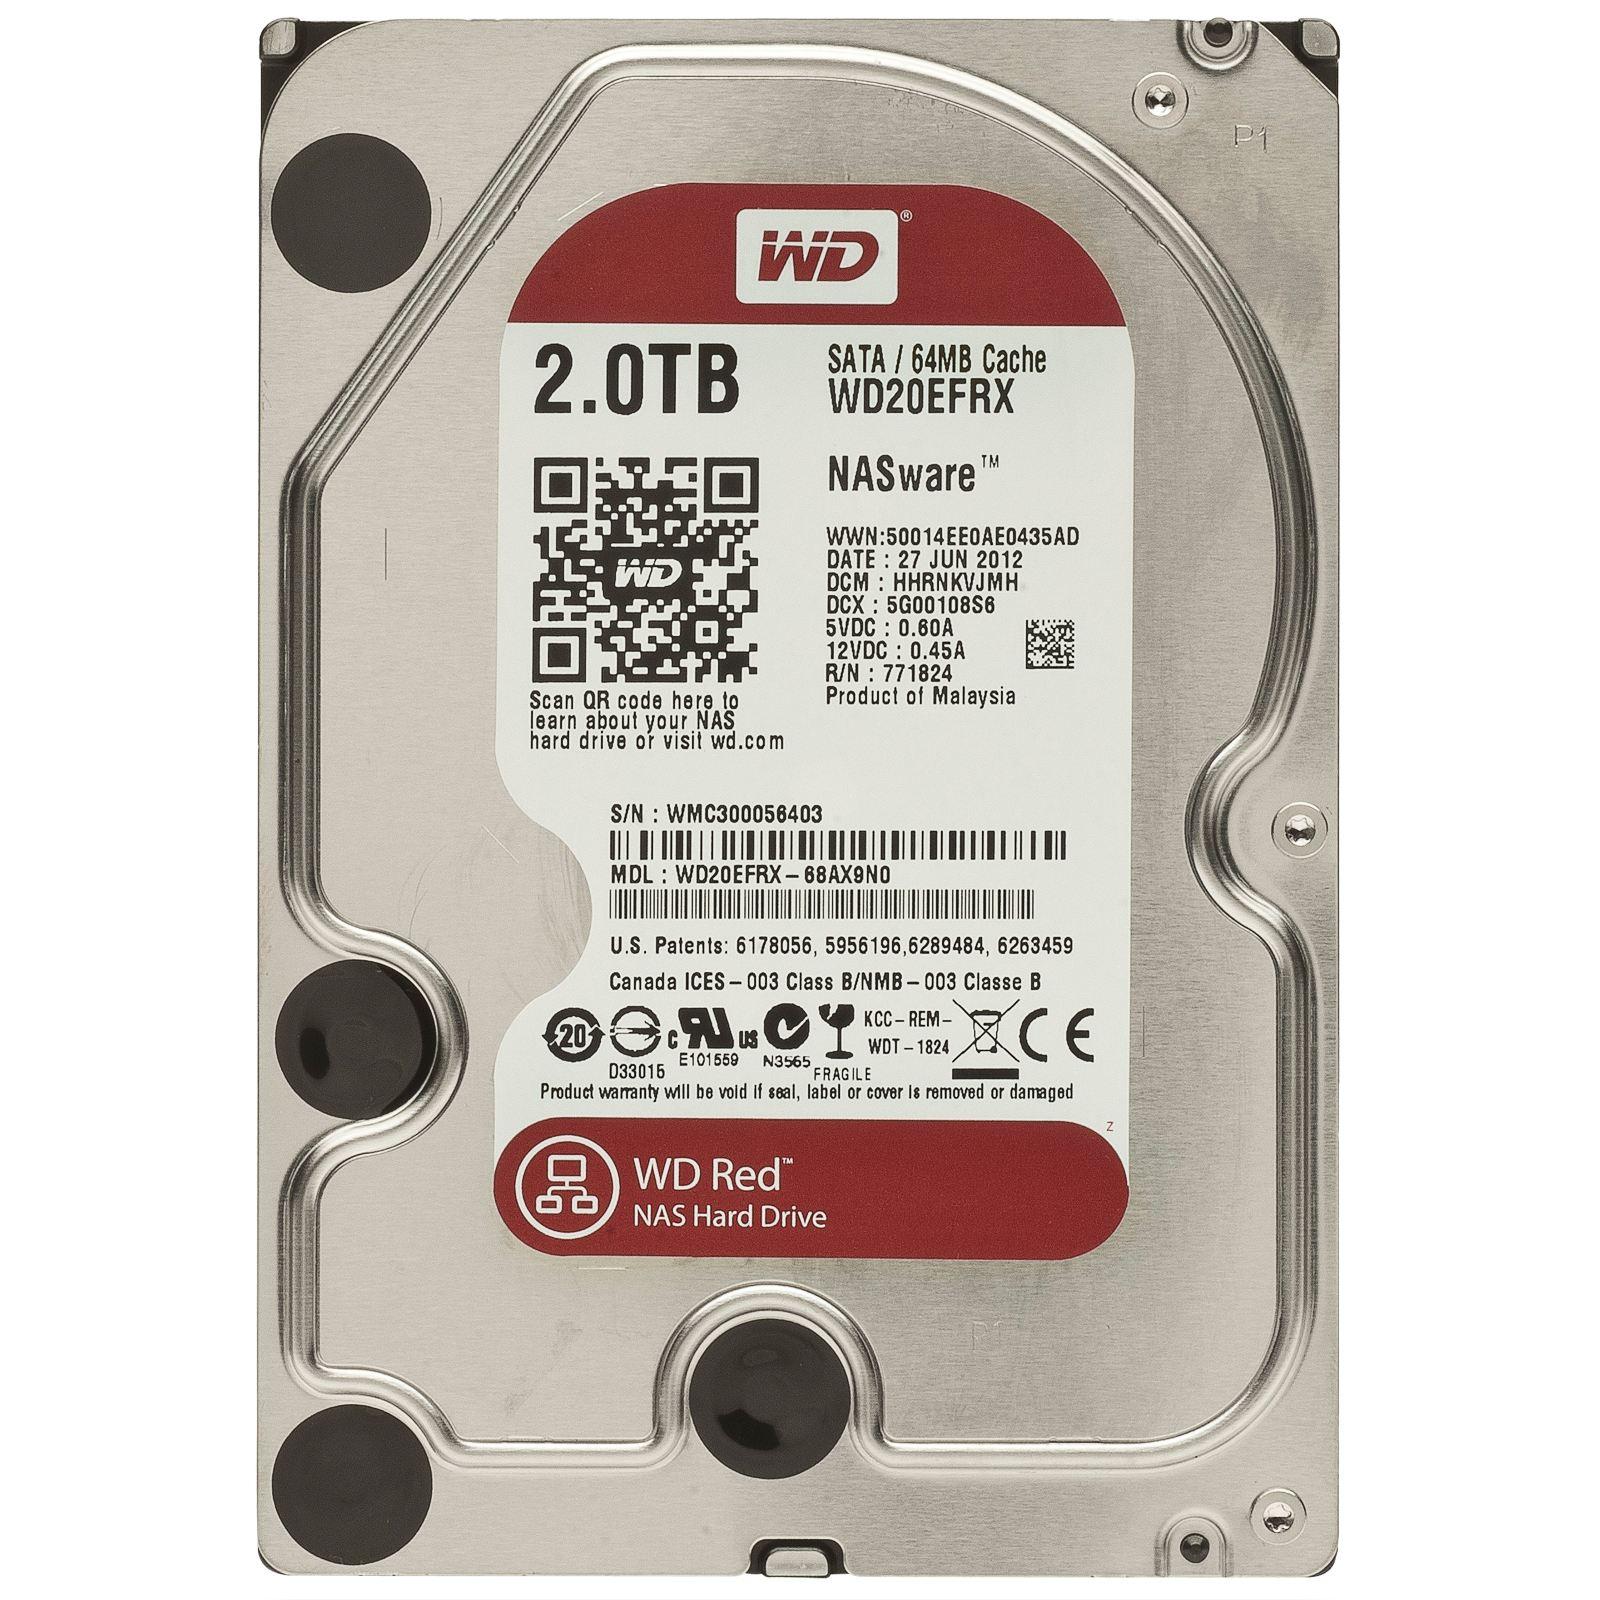 Жесткий диск WESTERN DIGITAL WD20EFRX 2TB SATA 6GB/S 64MB от Ravta